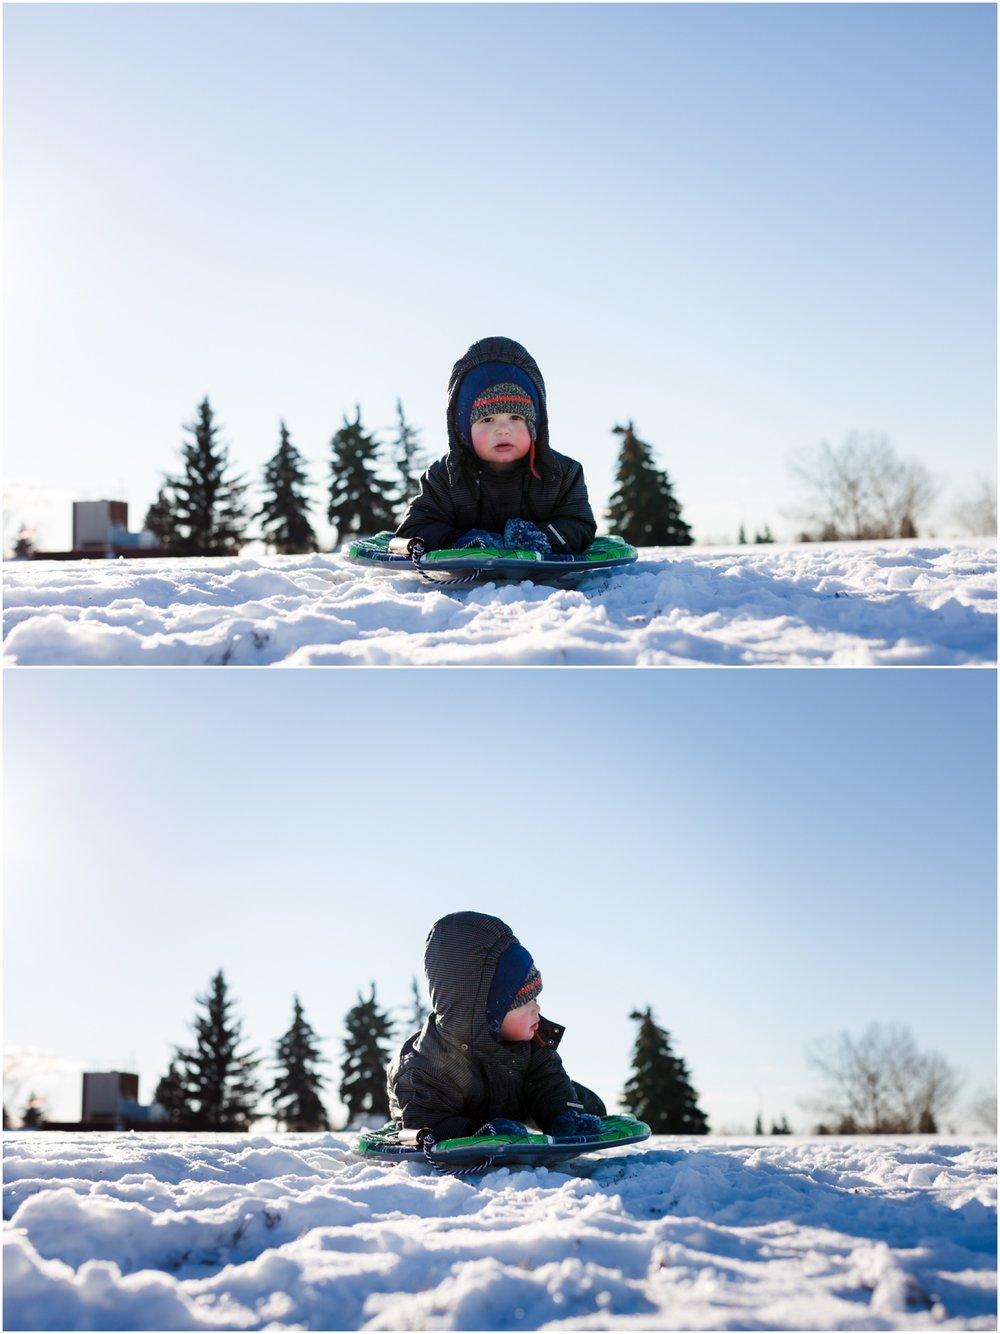 Edmonton lifestyle photographer - Best of 2016 - Sledding - Toboganning - Head first - no fear - toddler - winter - YEG - snowsuit